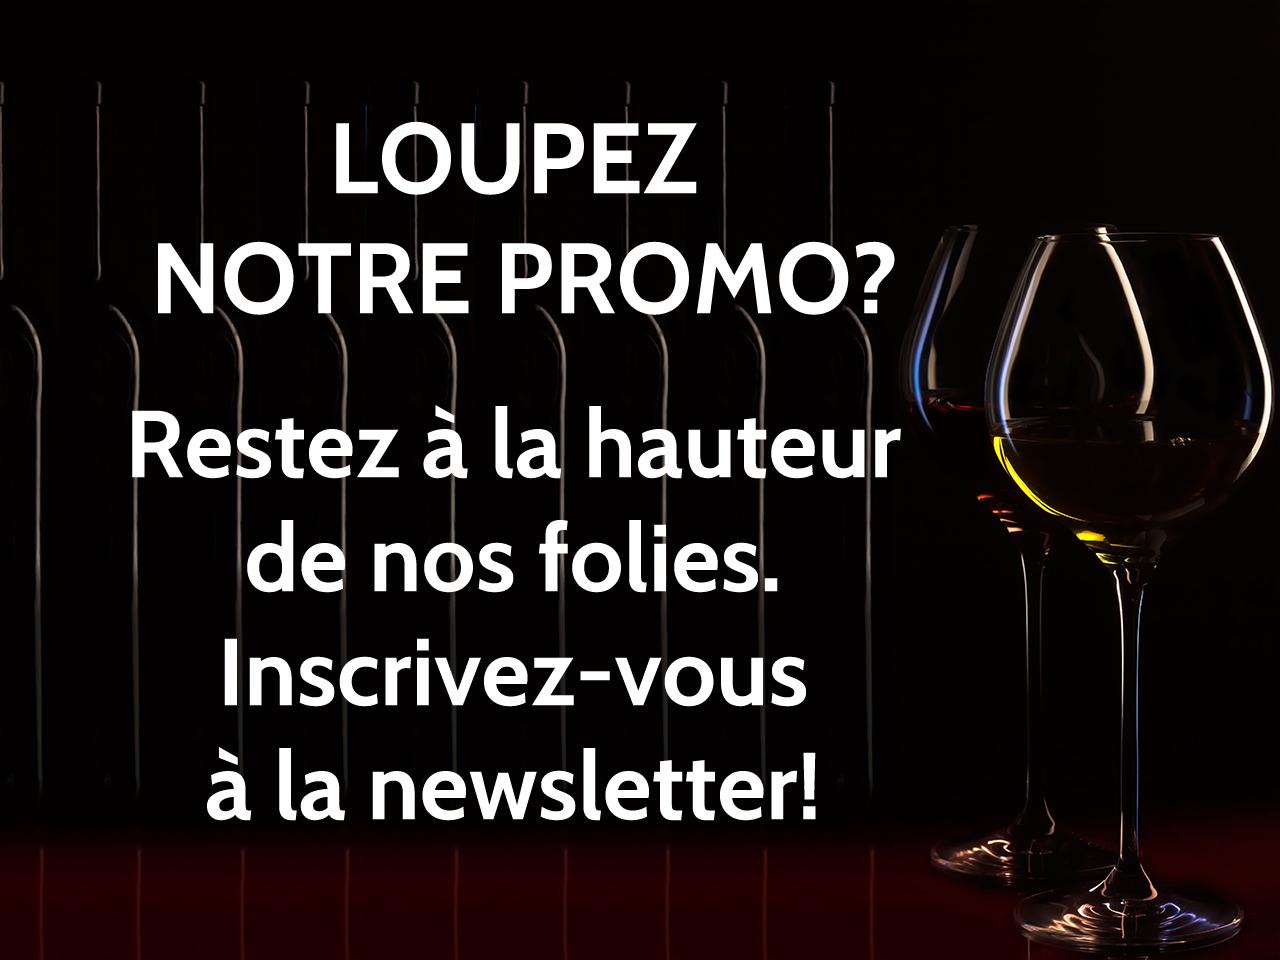 promo 4 + 2 offertes espagne Rioja crianza as laxas albarino